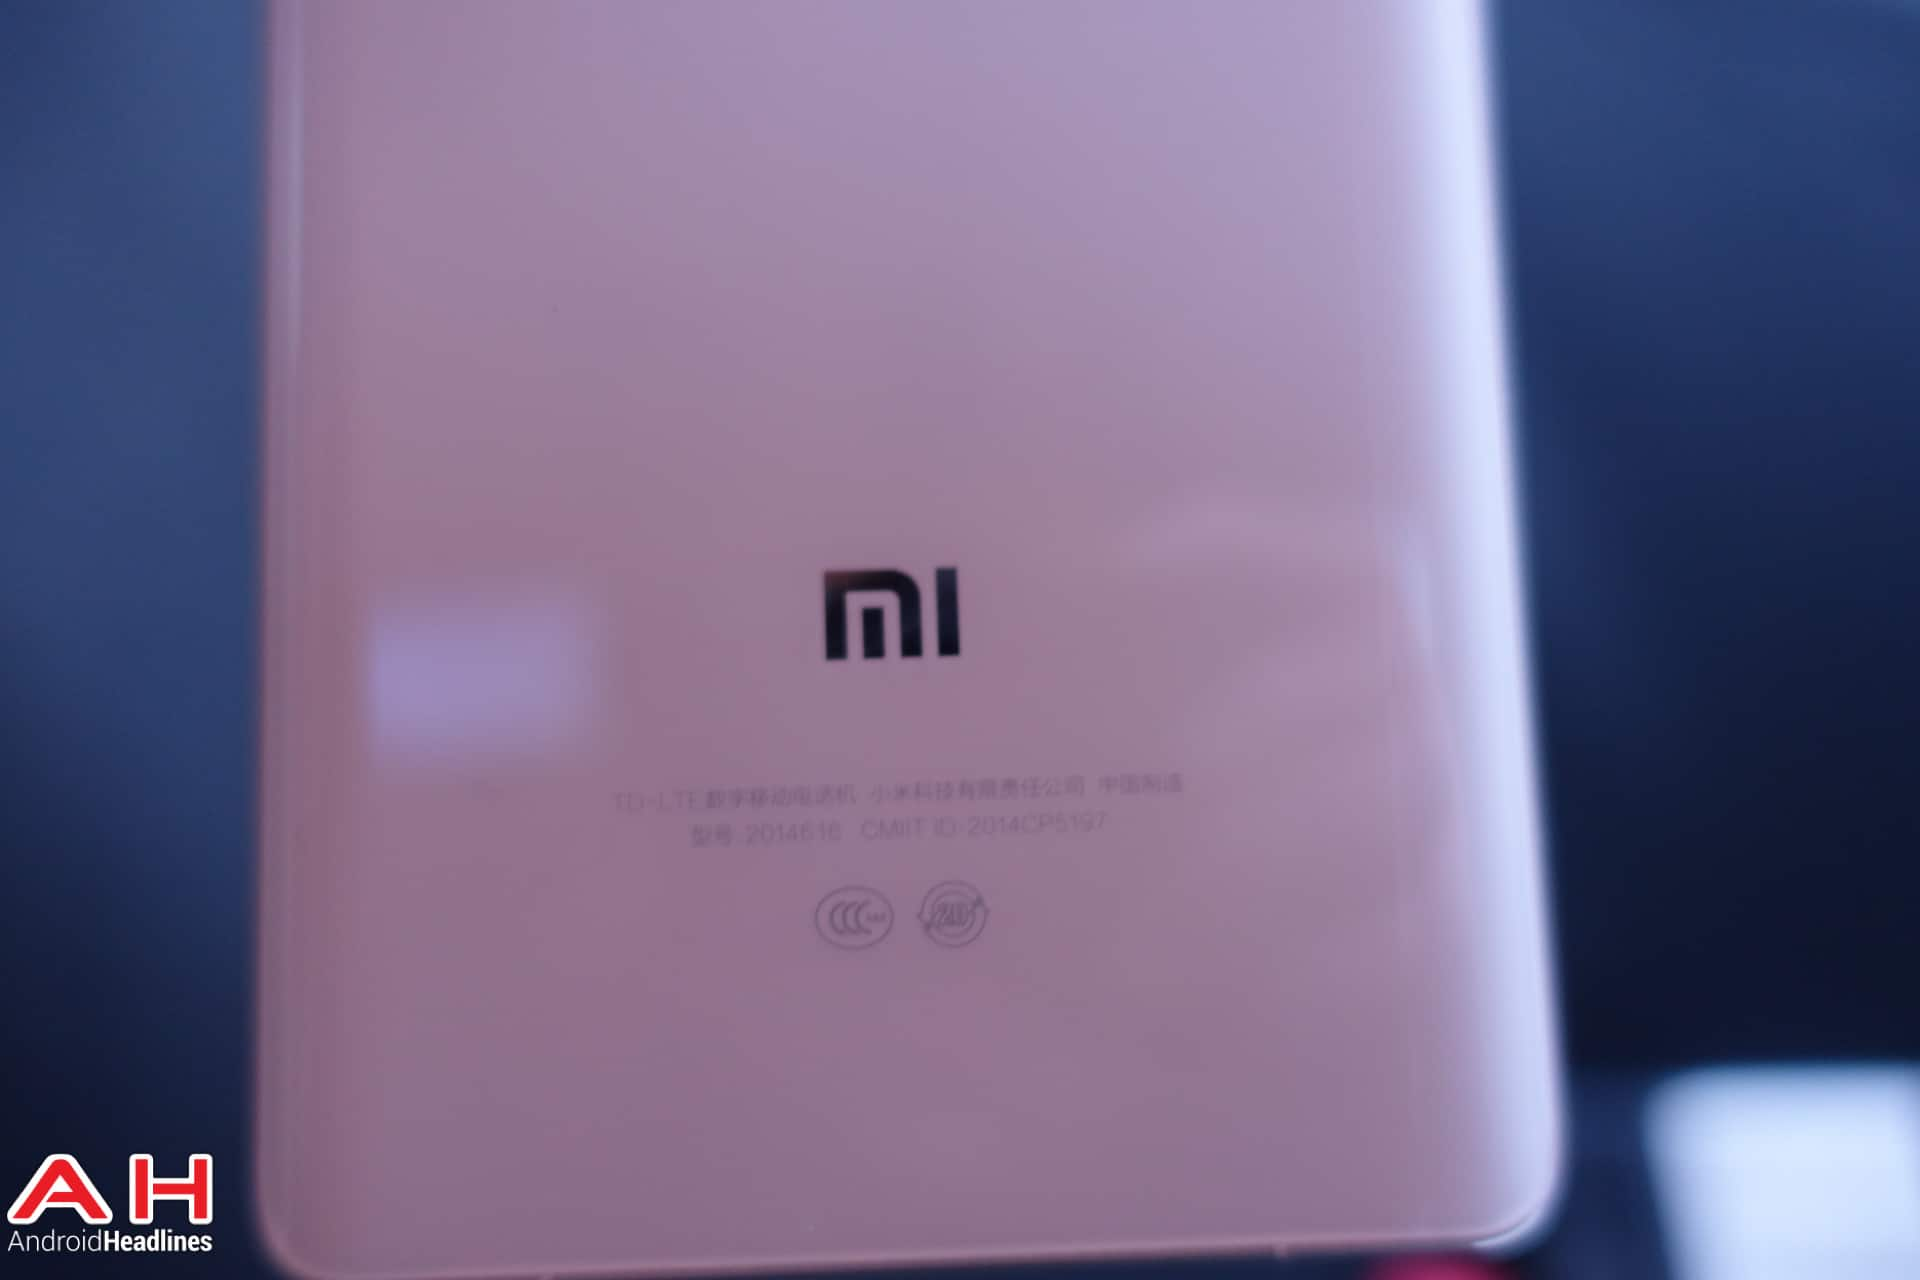 Xiaomi-Mi-Note-AH-03872